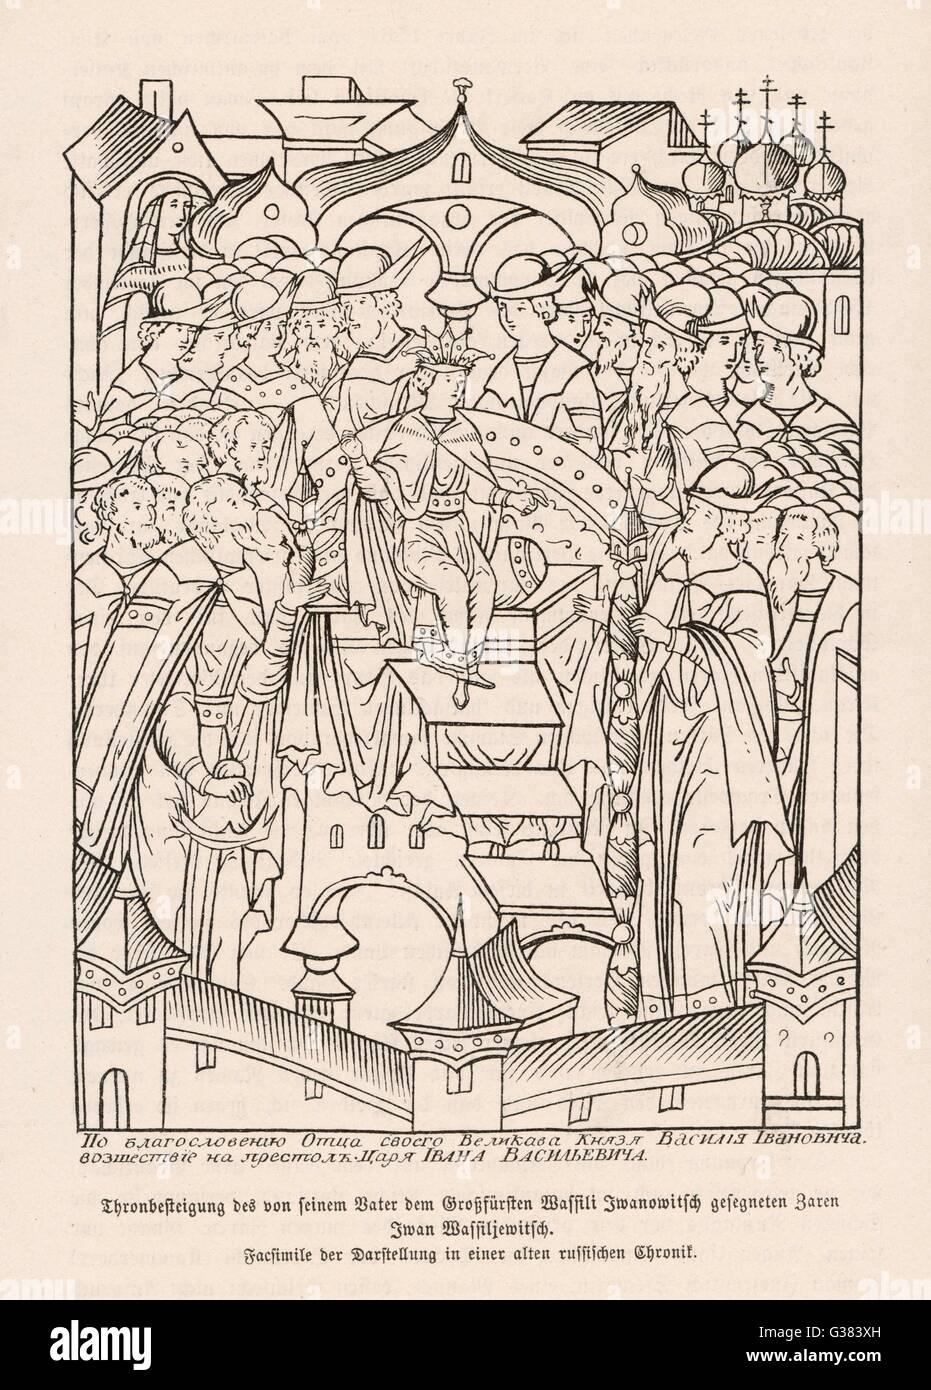 Coronation of Ivan IV (the  Terrible)        Date: 1547 - Stock Image